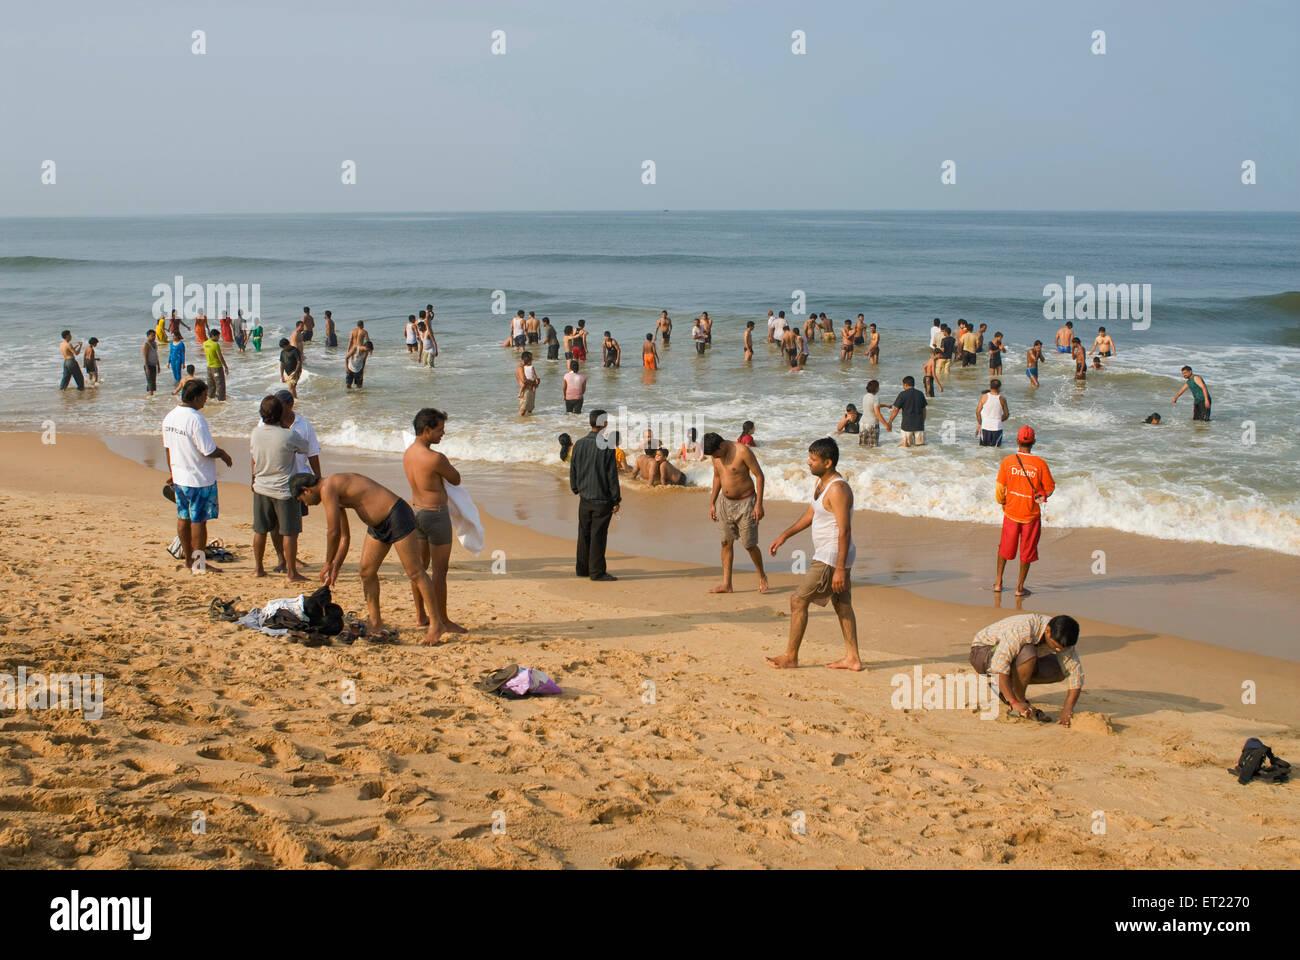 Goa Beach Enjoying High Resolution Stock Photography And Images Alamy